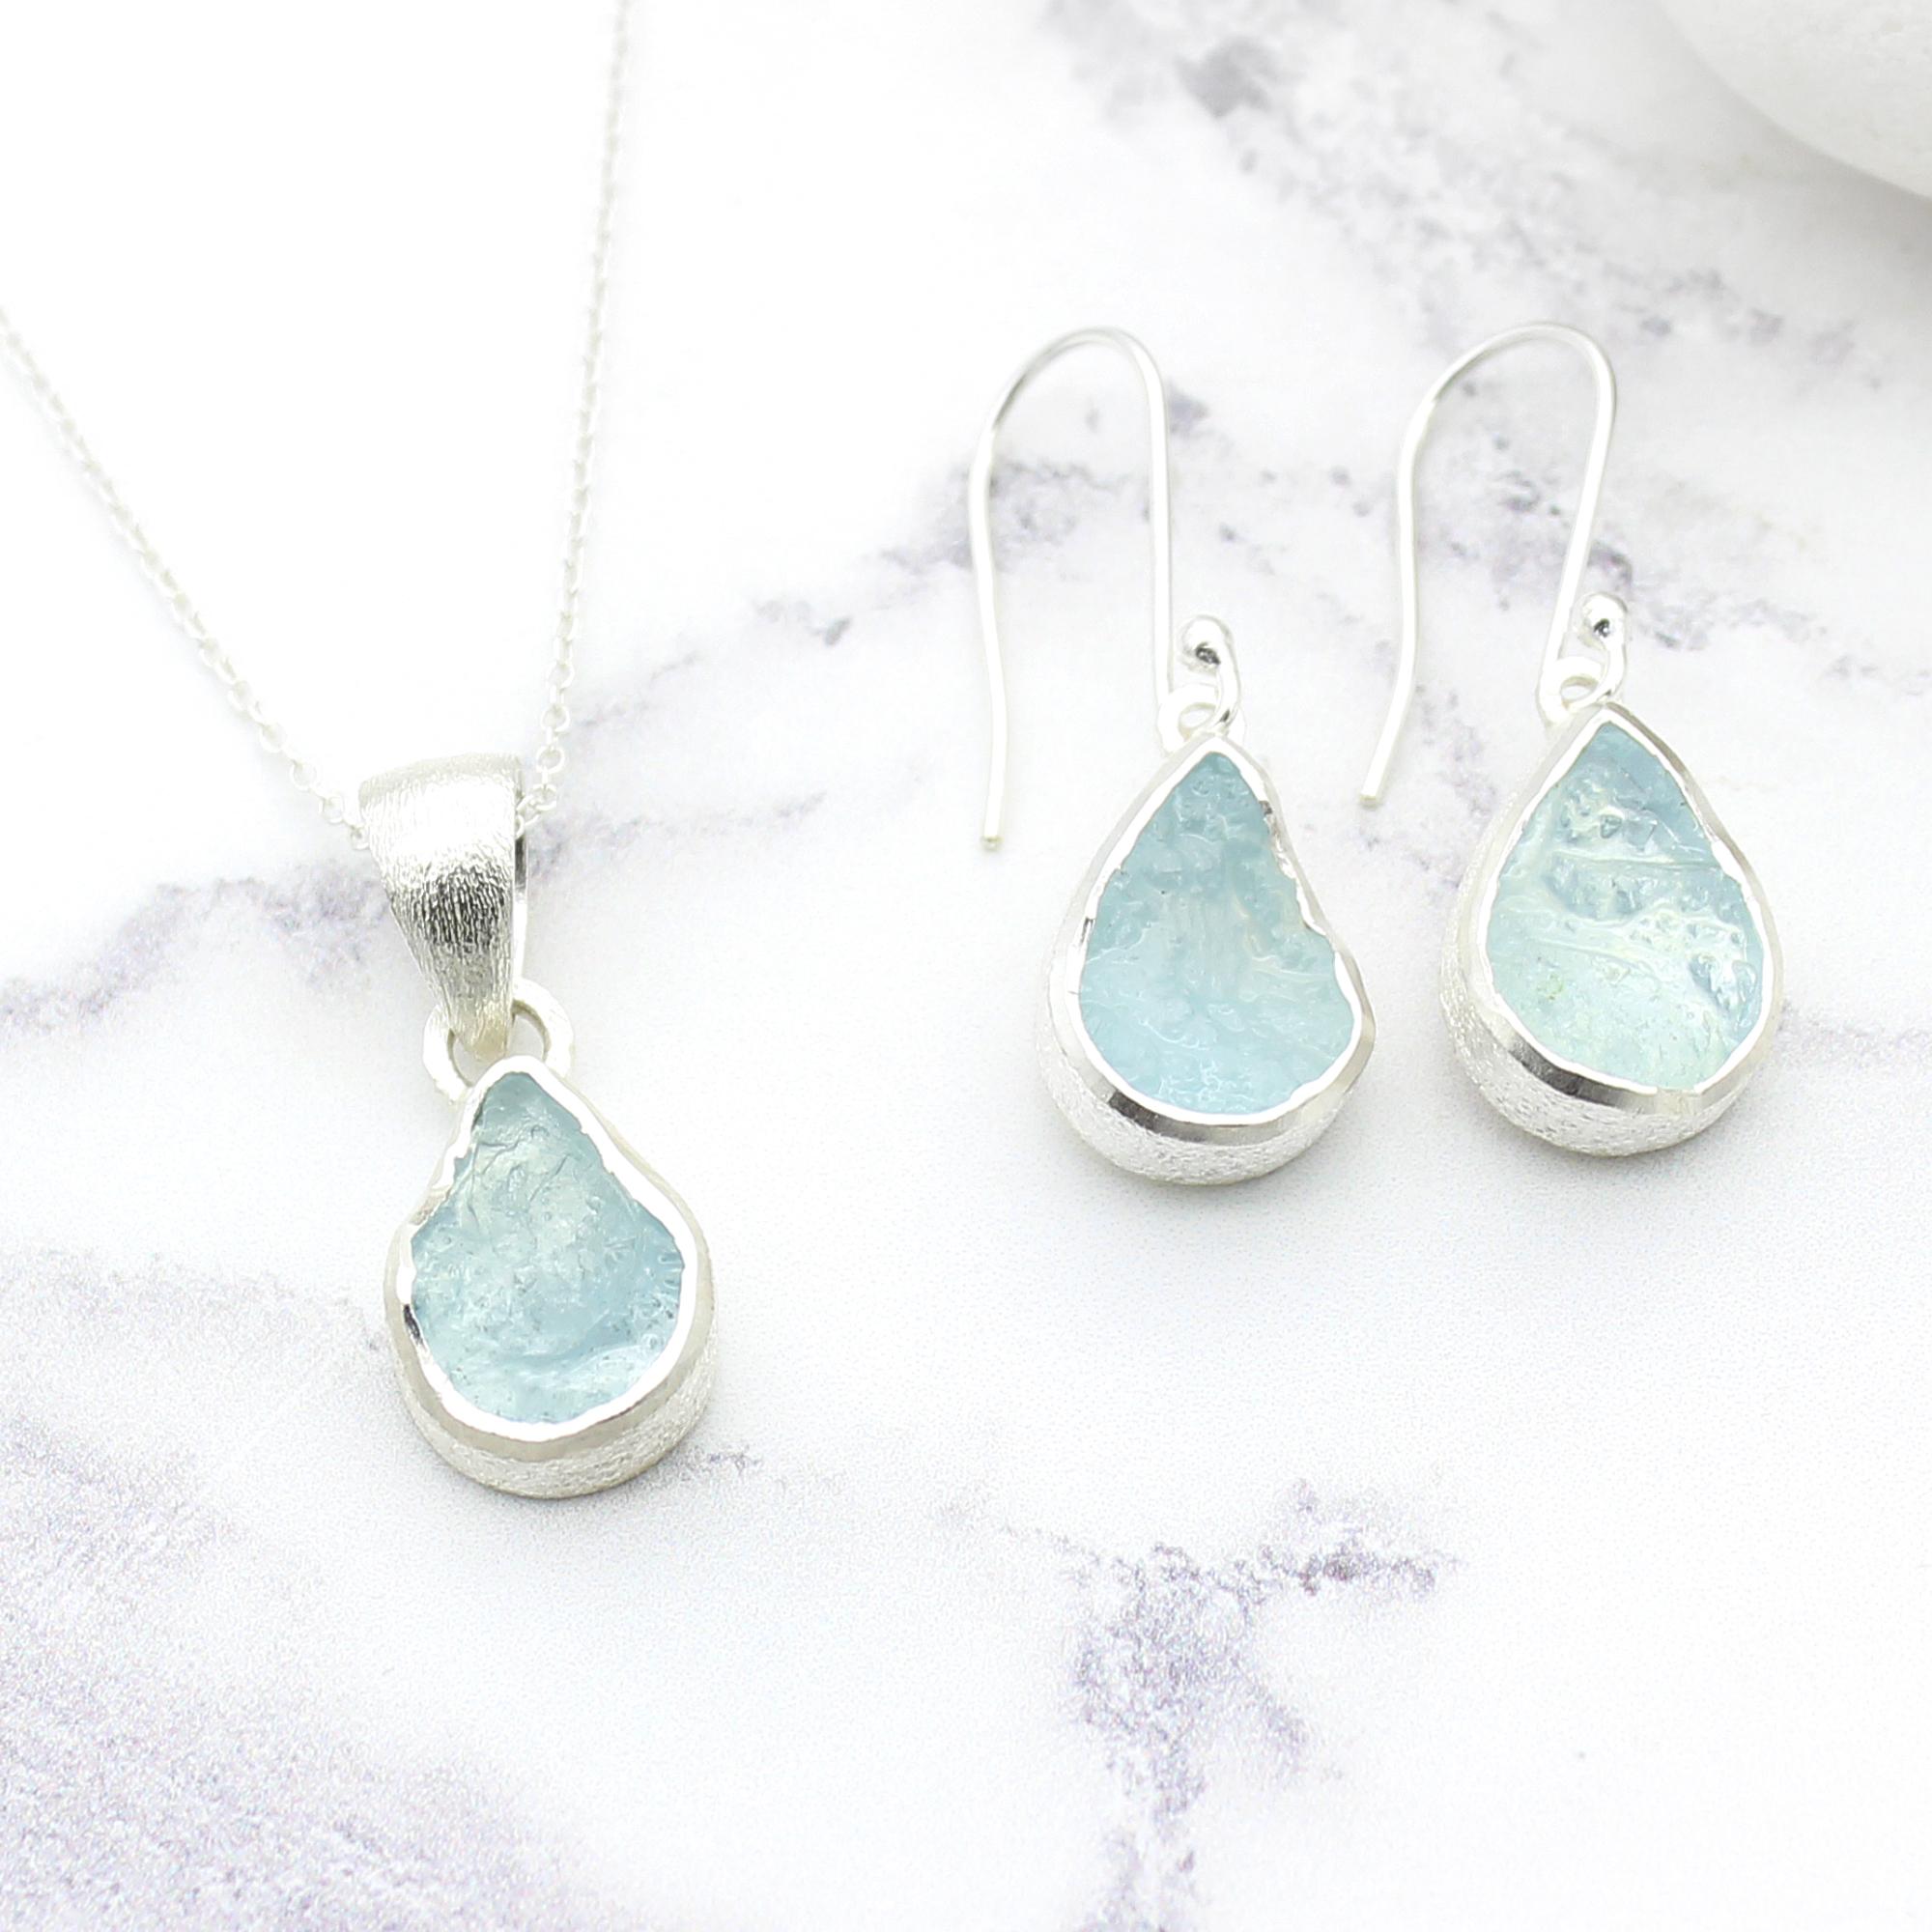 Aquamarine Gemstone Silver Pendant and Earrings Set